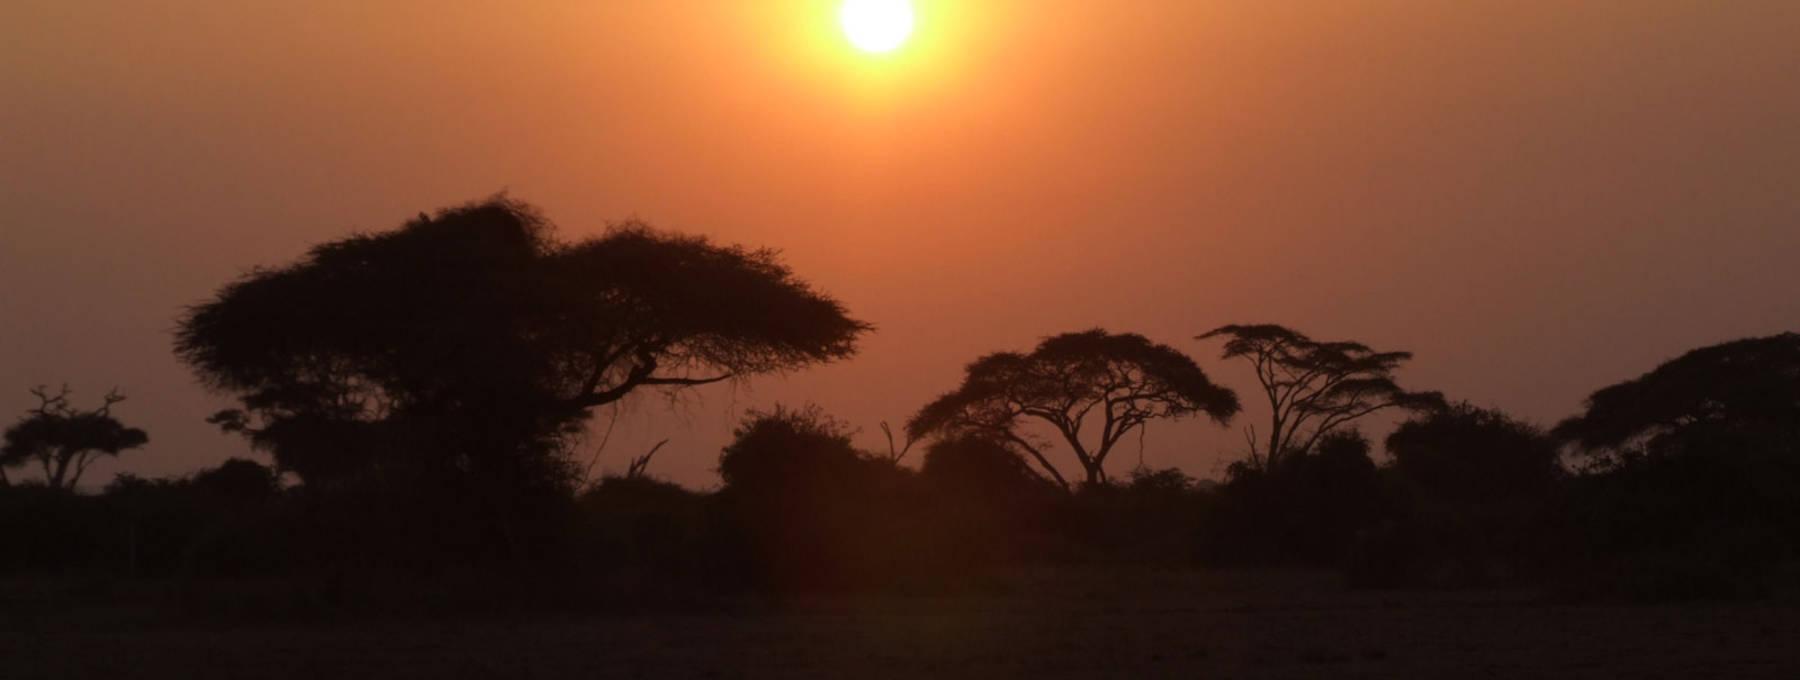 Auslandsaufenthalt Kenia